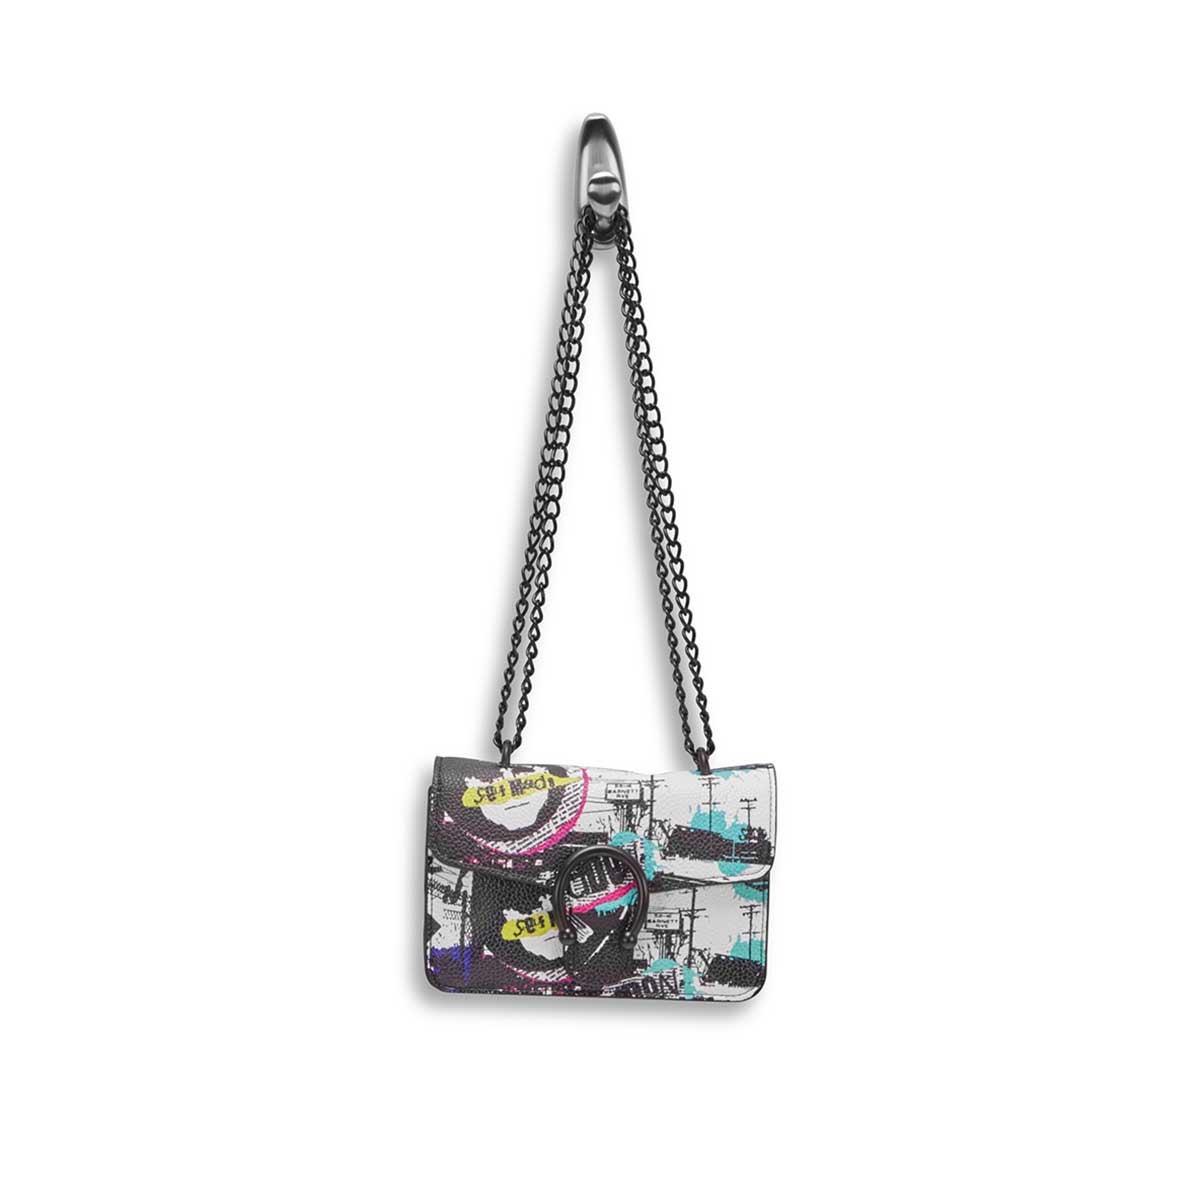 Lds BPeggy bk/mlt pop art cross body bag